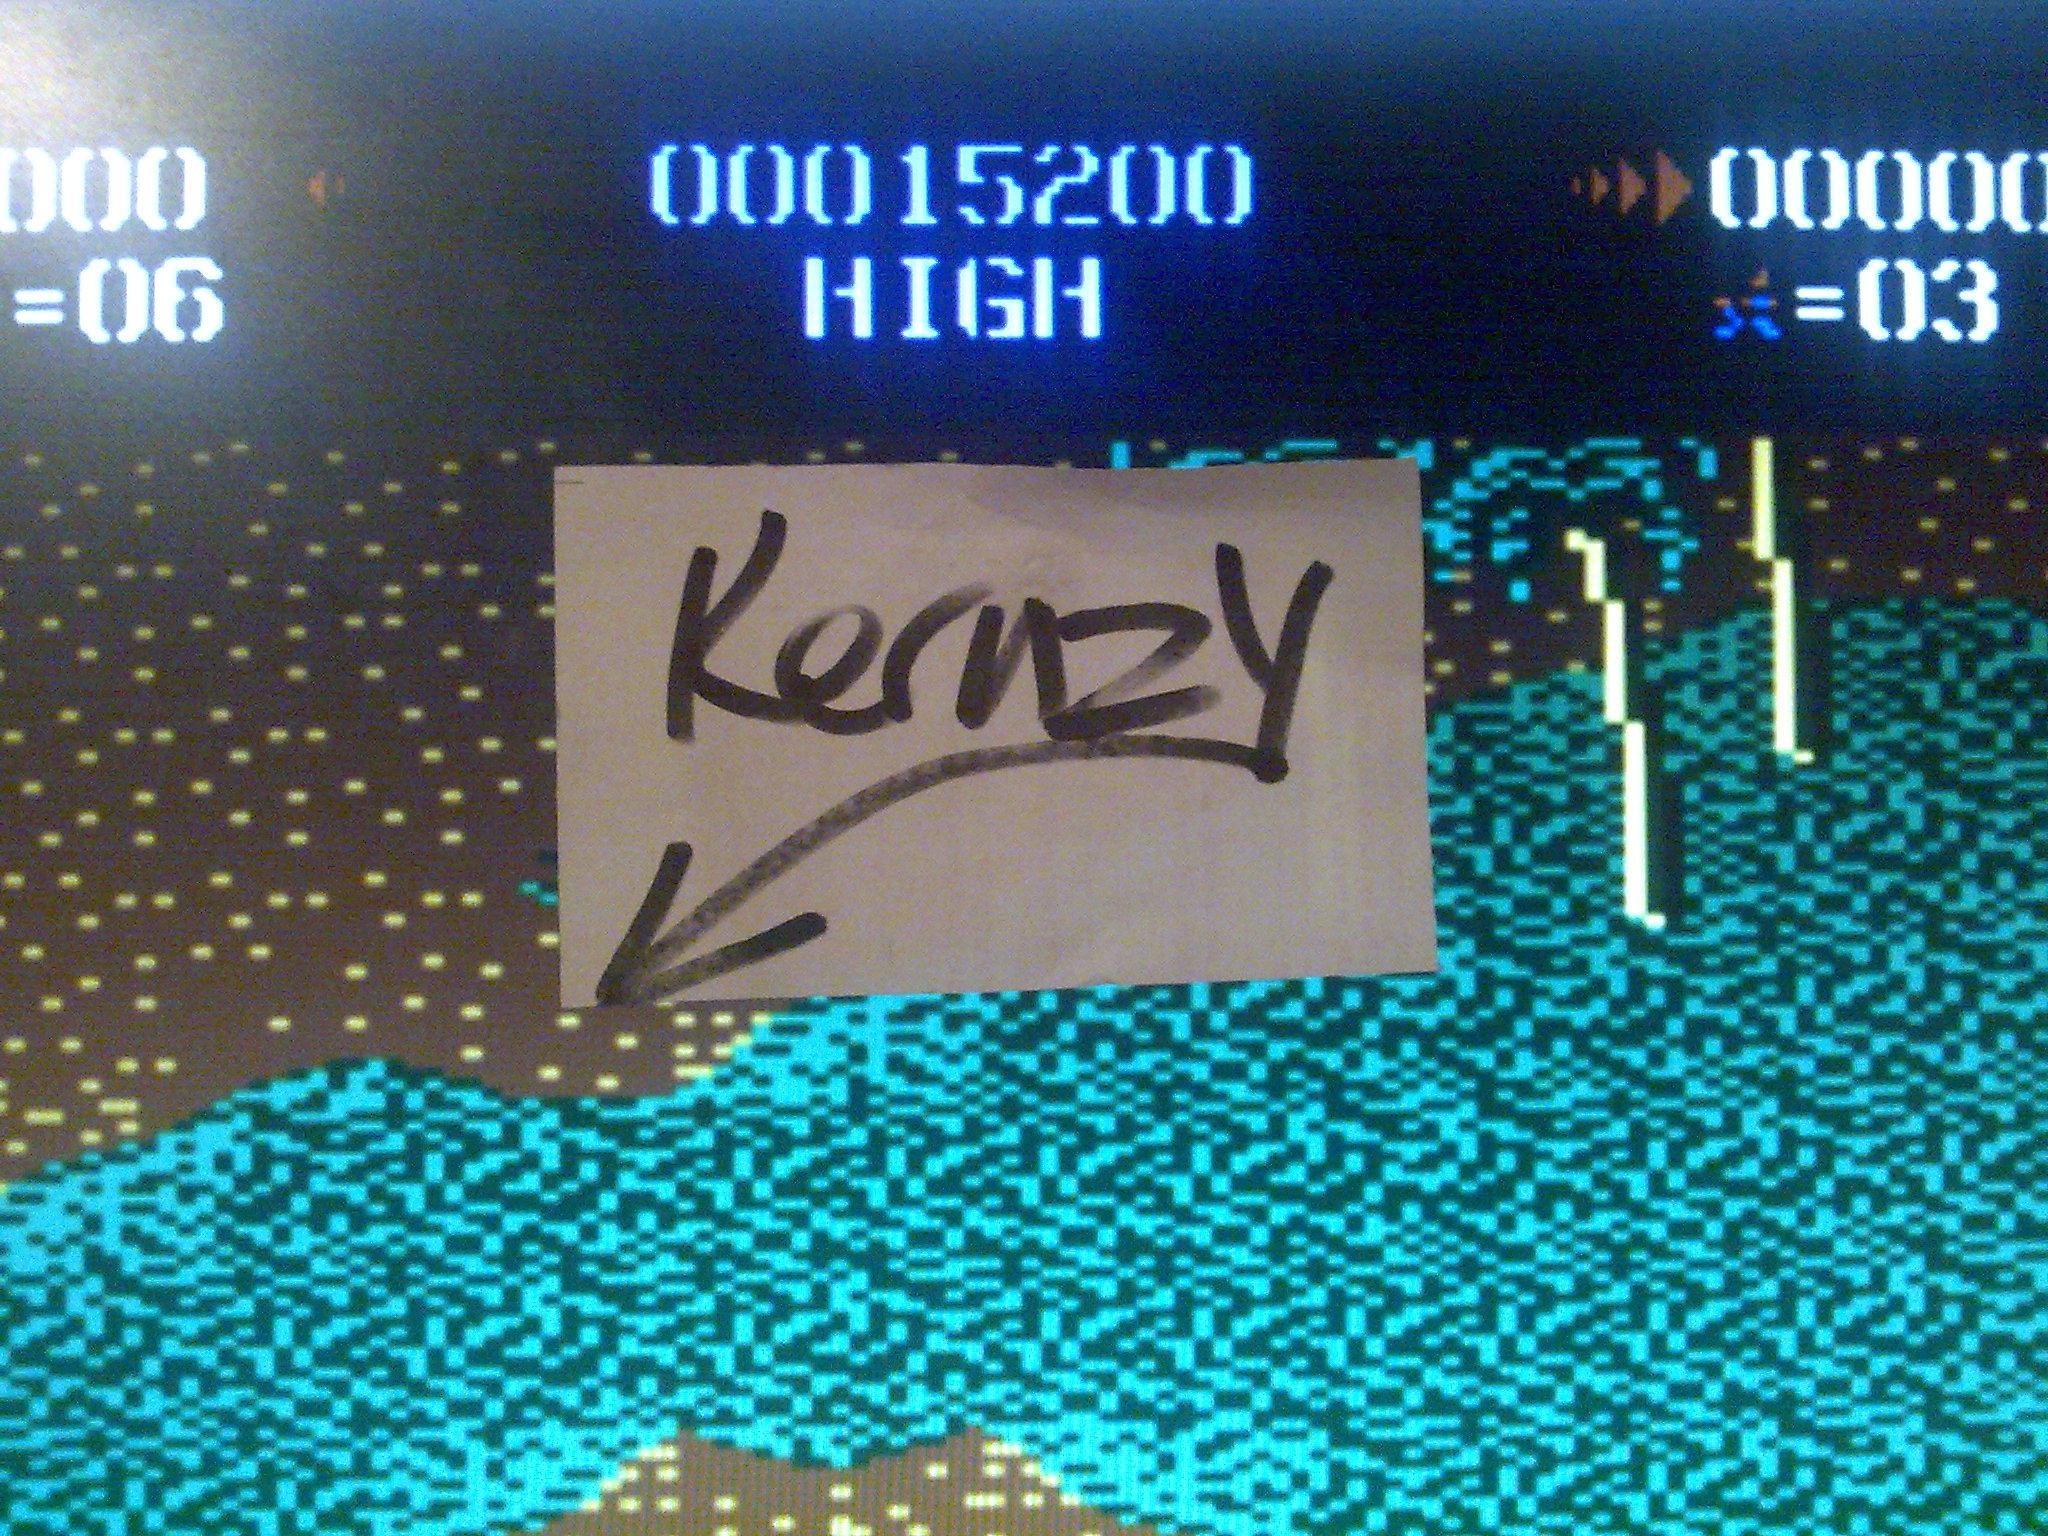 kernzy: Commando: Advanced (Atari 7800 Emulated) 15,200 points on 2014-10-19 01:21:12